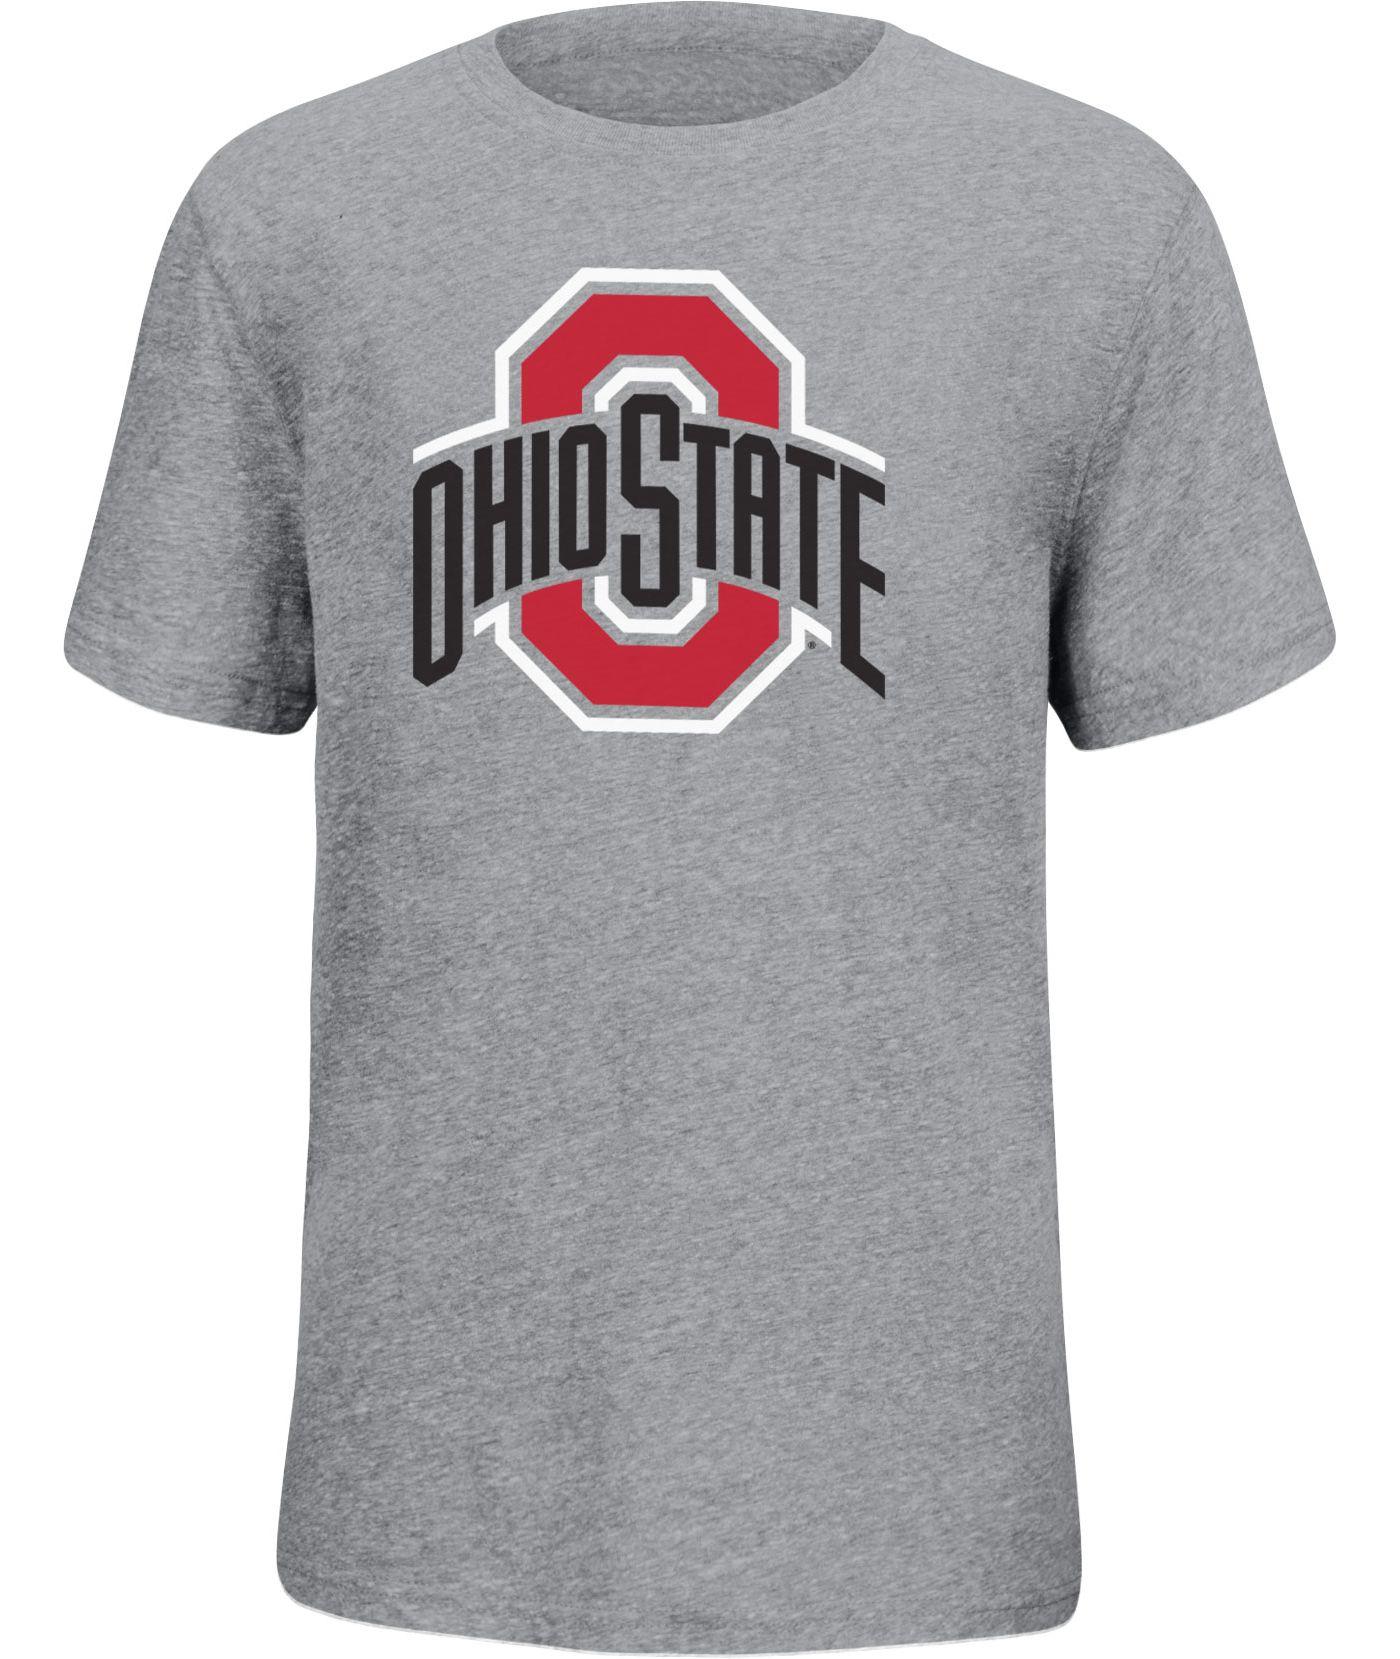 Scarlet & Gray Youth Ohio State Buckeyes Gray Staple T-Shirt